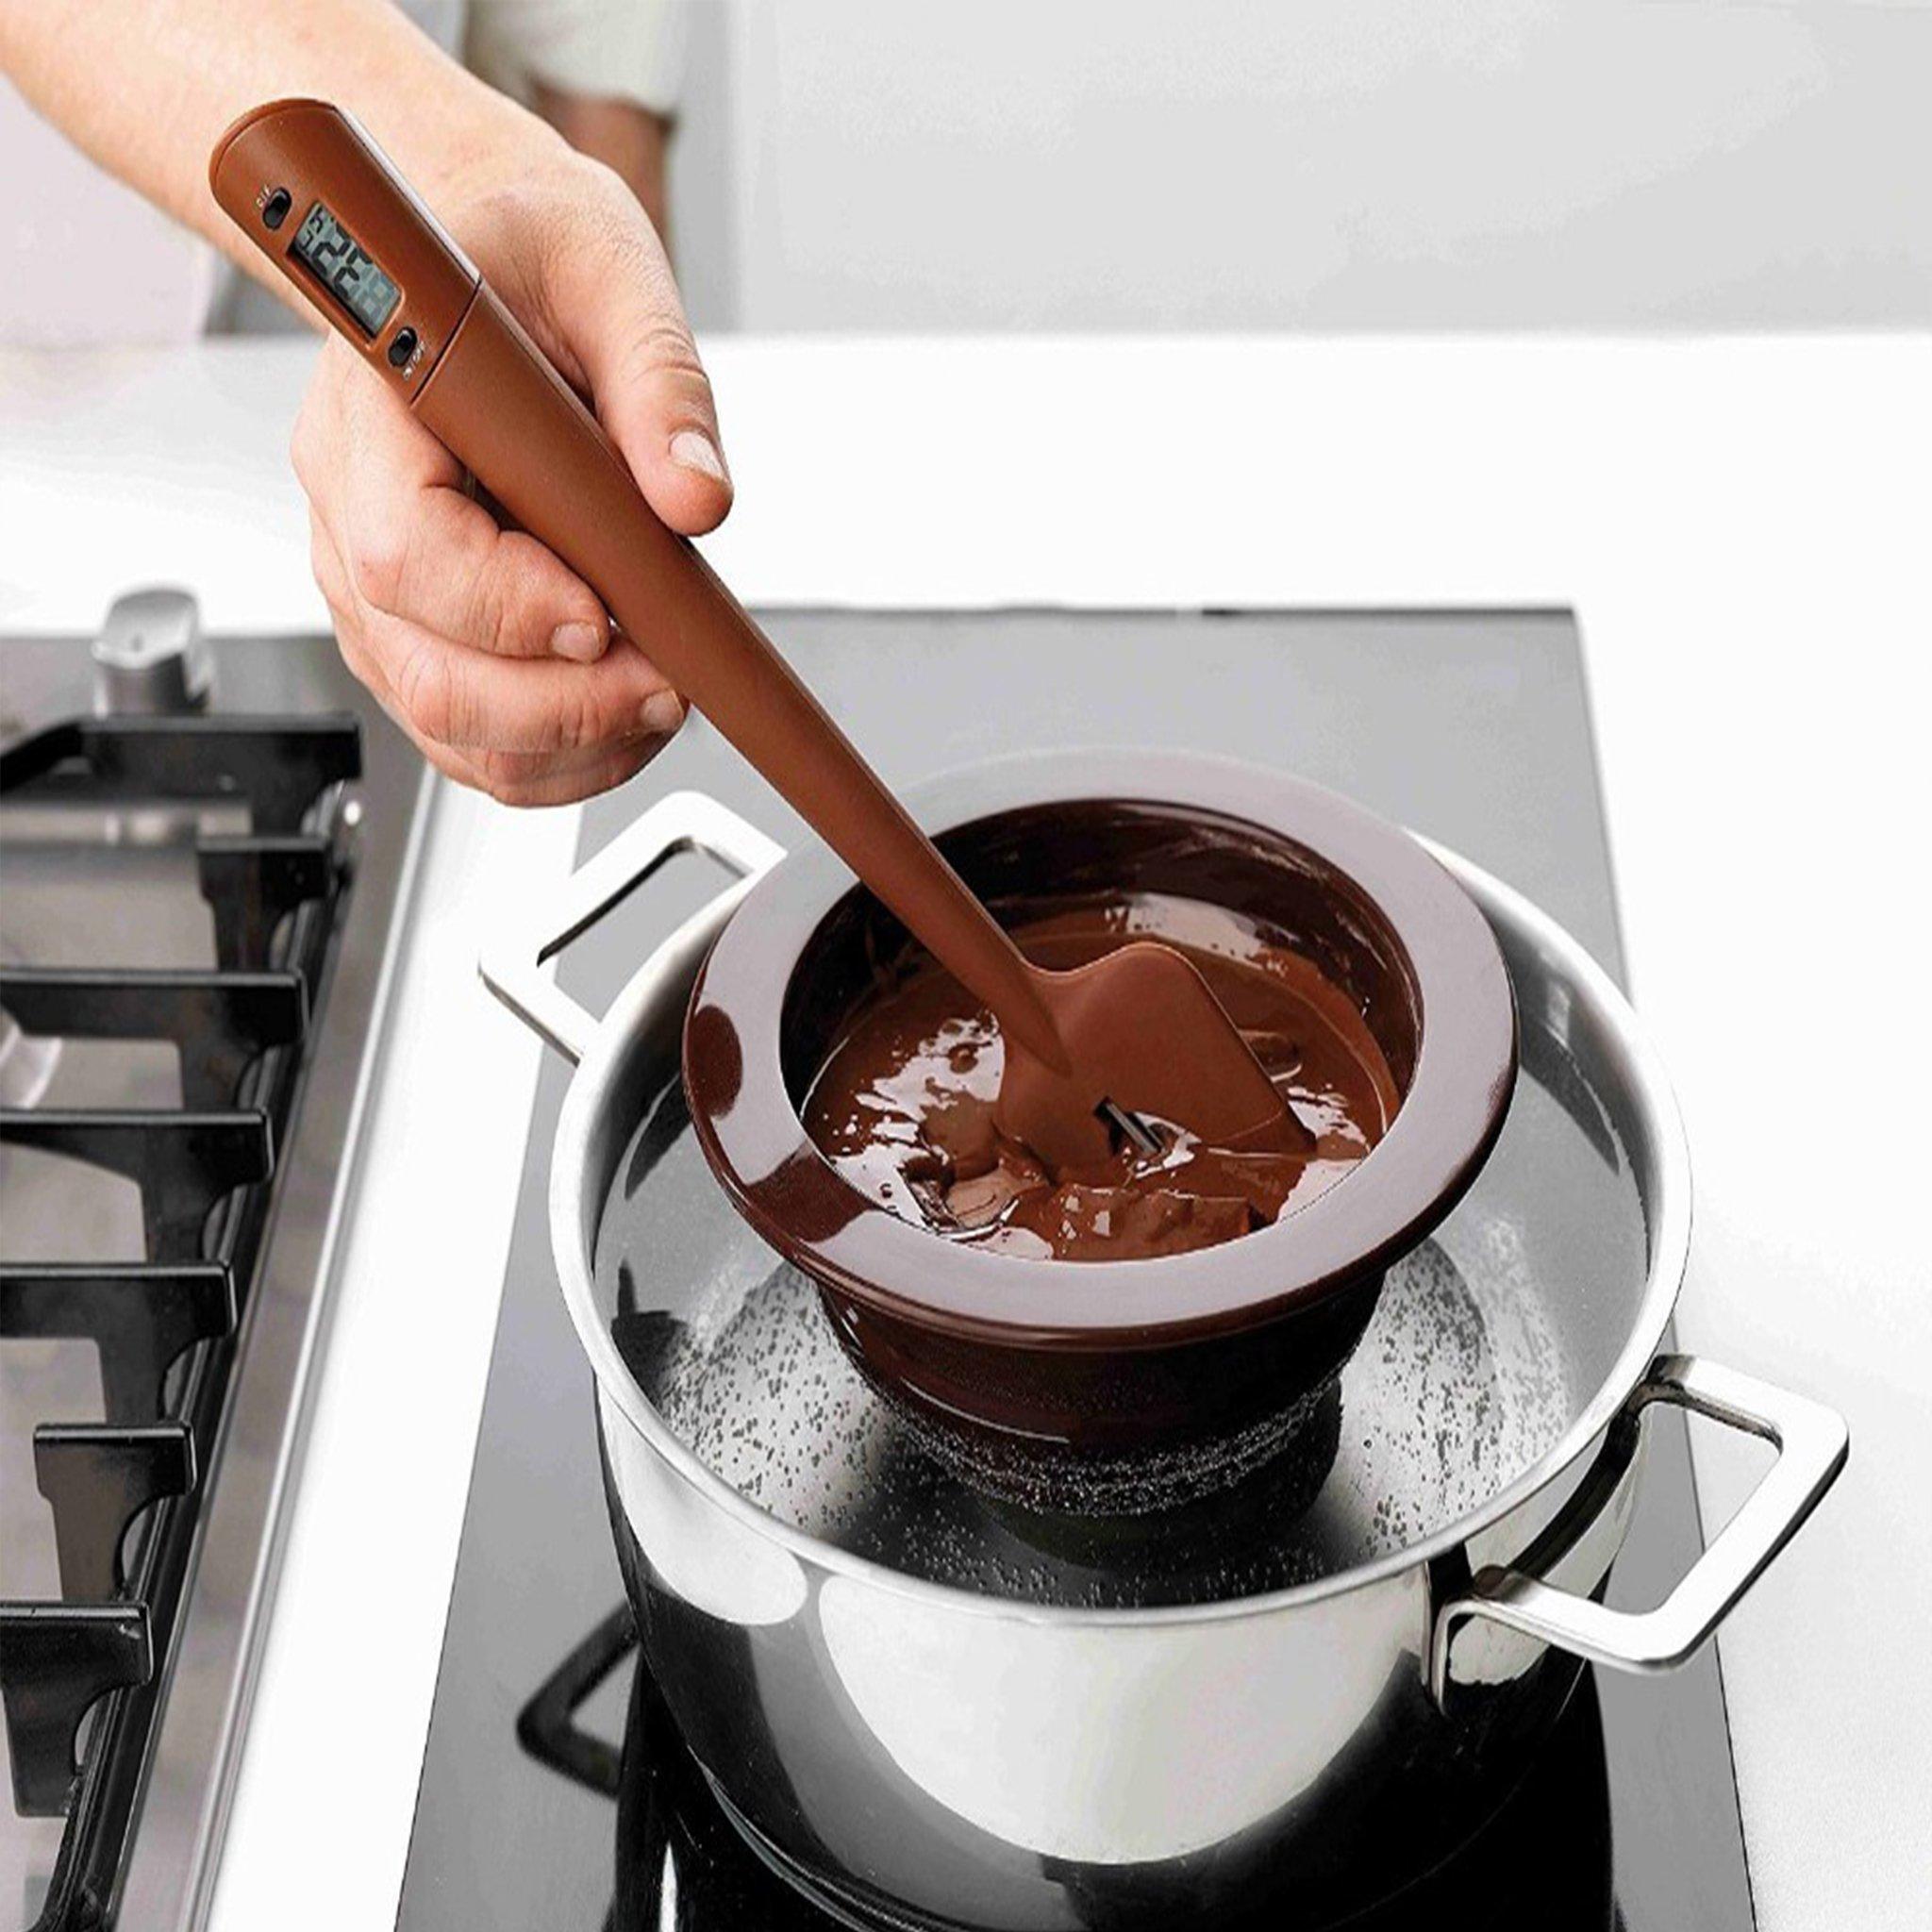 JIAYE Food Grade Silicone/Nylon Spatula Digital Thermometer Scraper for Chocolate Jams Food Cooking Baking BBQ by JIAYE INC (Image #2)